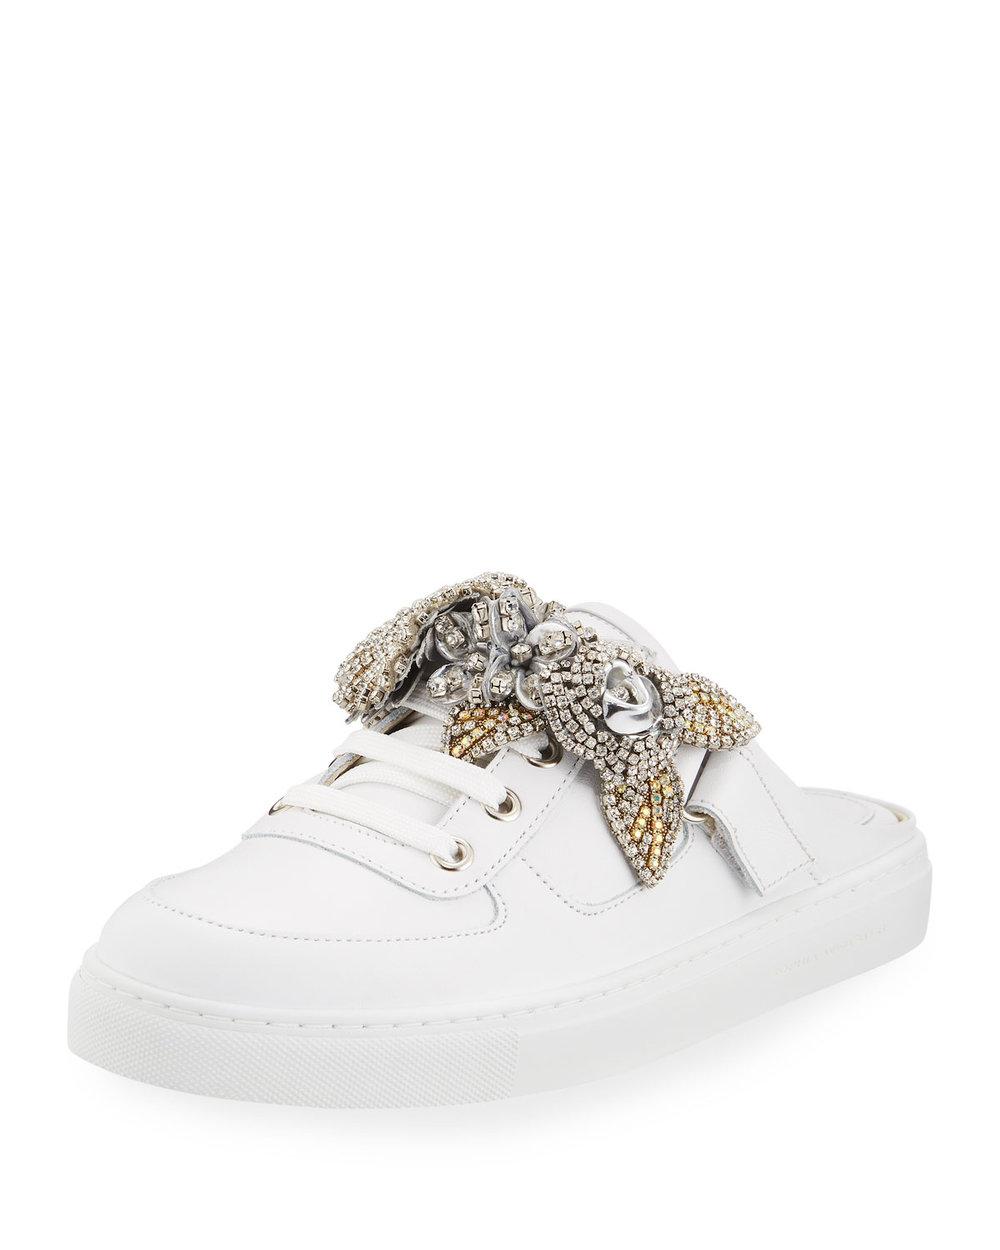 Sophia Webster Lilico Jessie Crystal Sneaker   $650.00